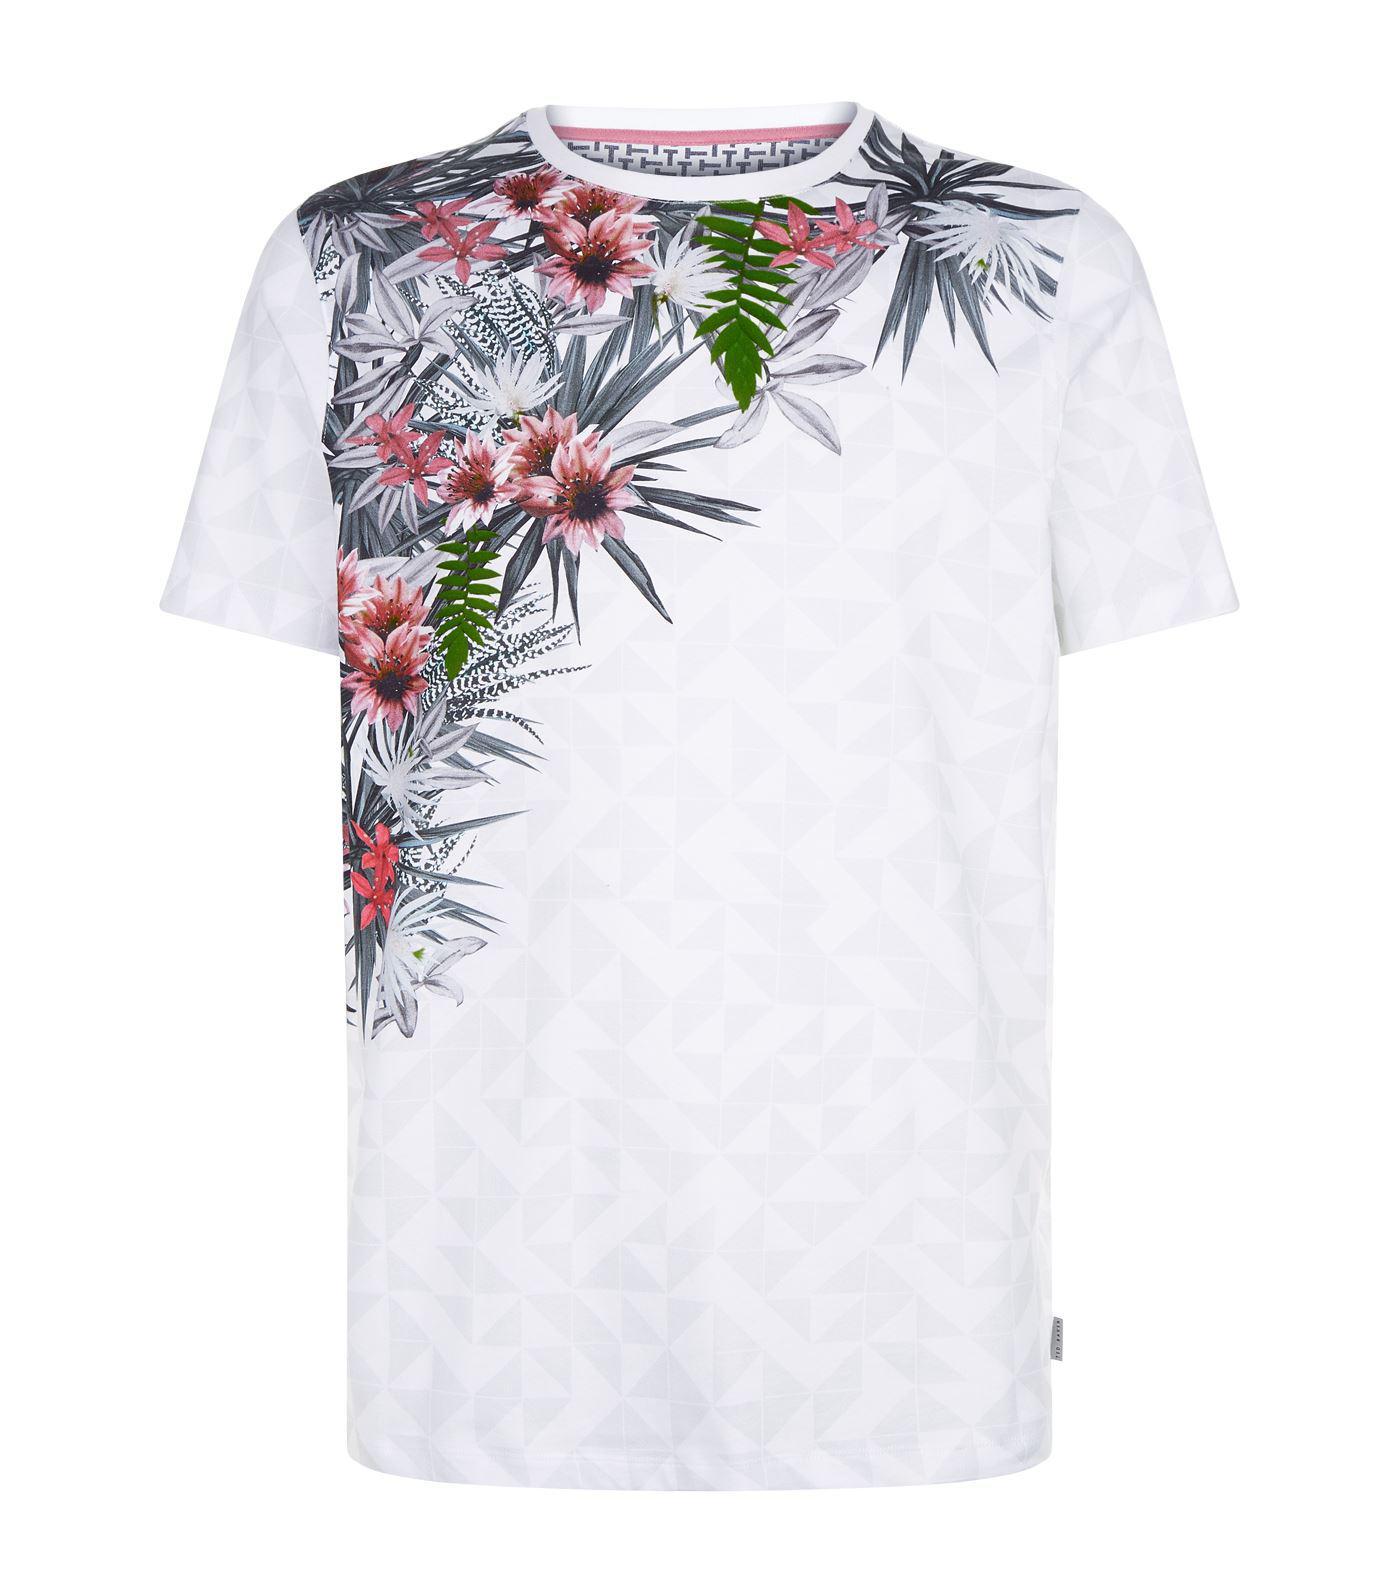 5b02096c62fbd0 Ted Baker Lassie Floral Print T-shirt in White for Men - Lyst